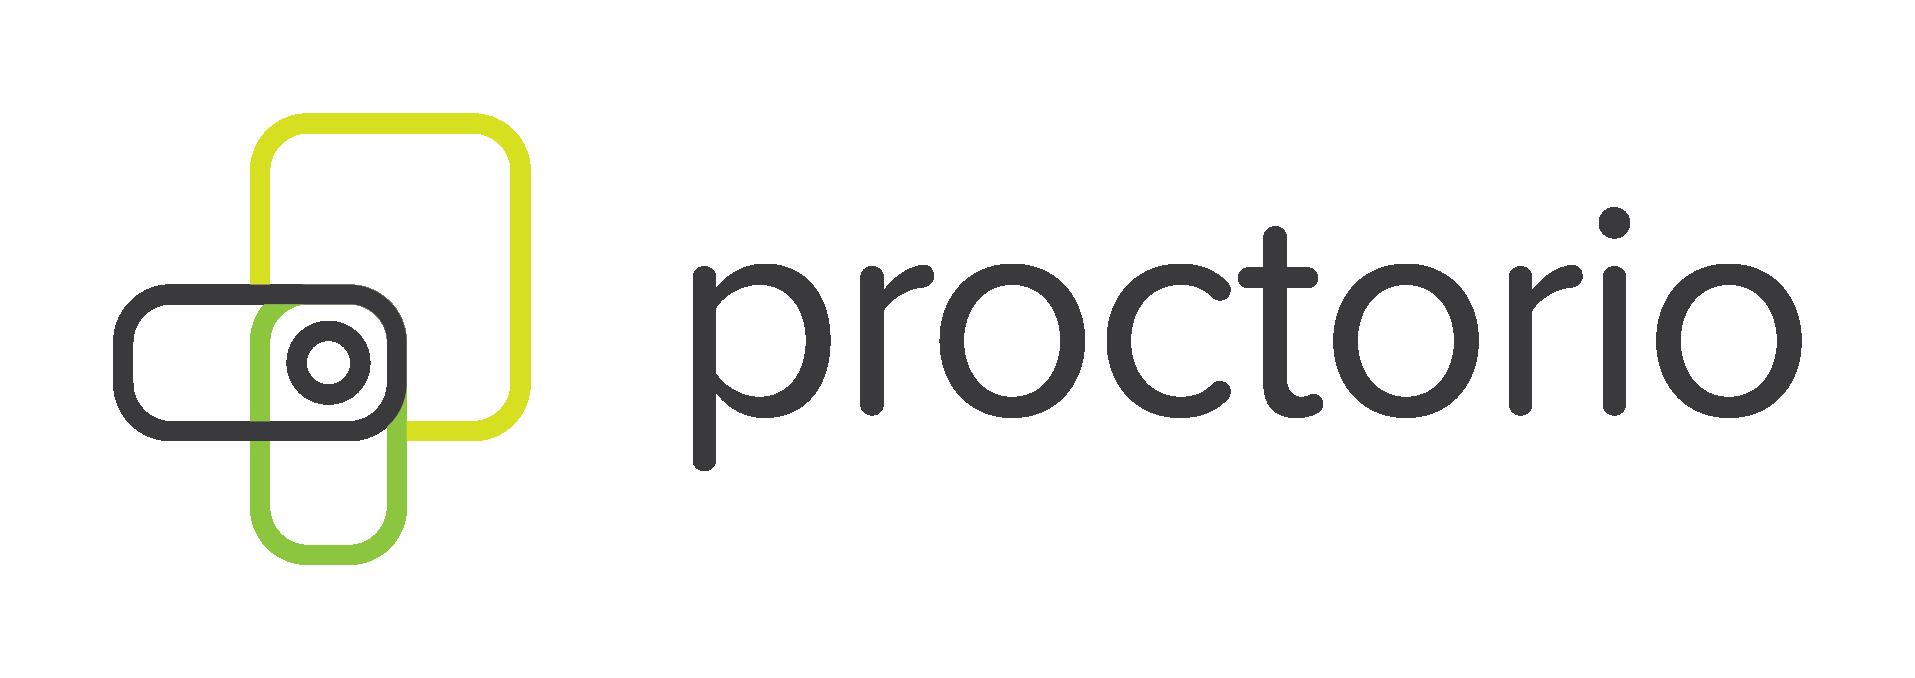 Proctorio GmbH